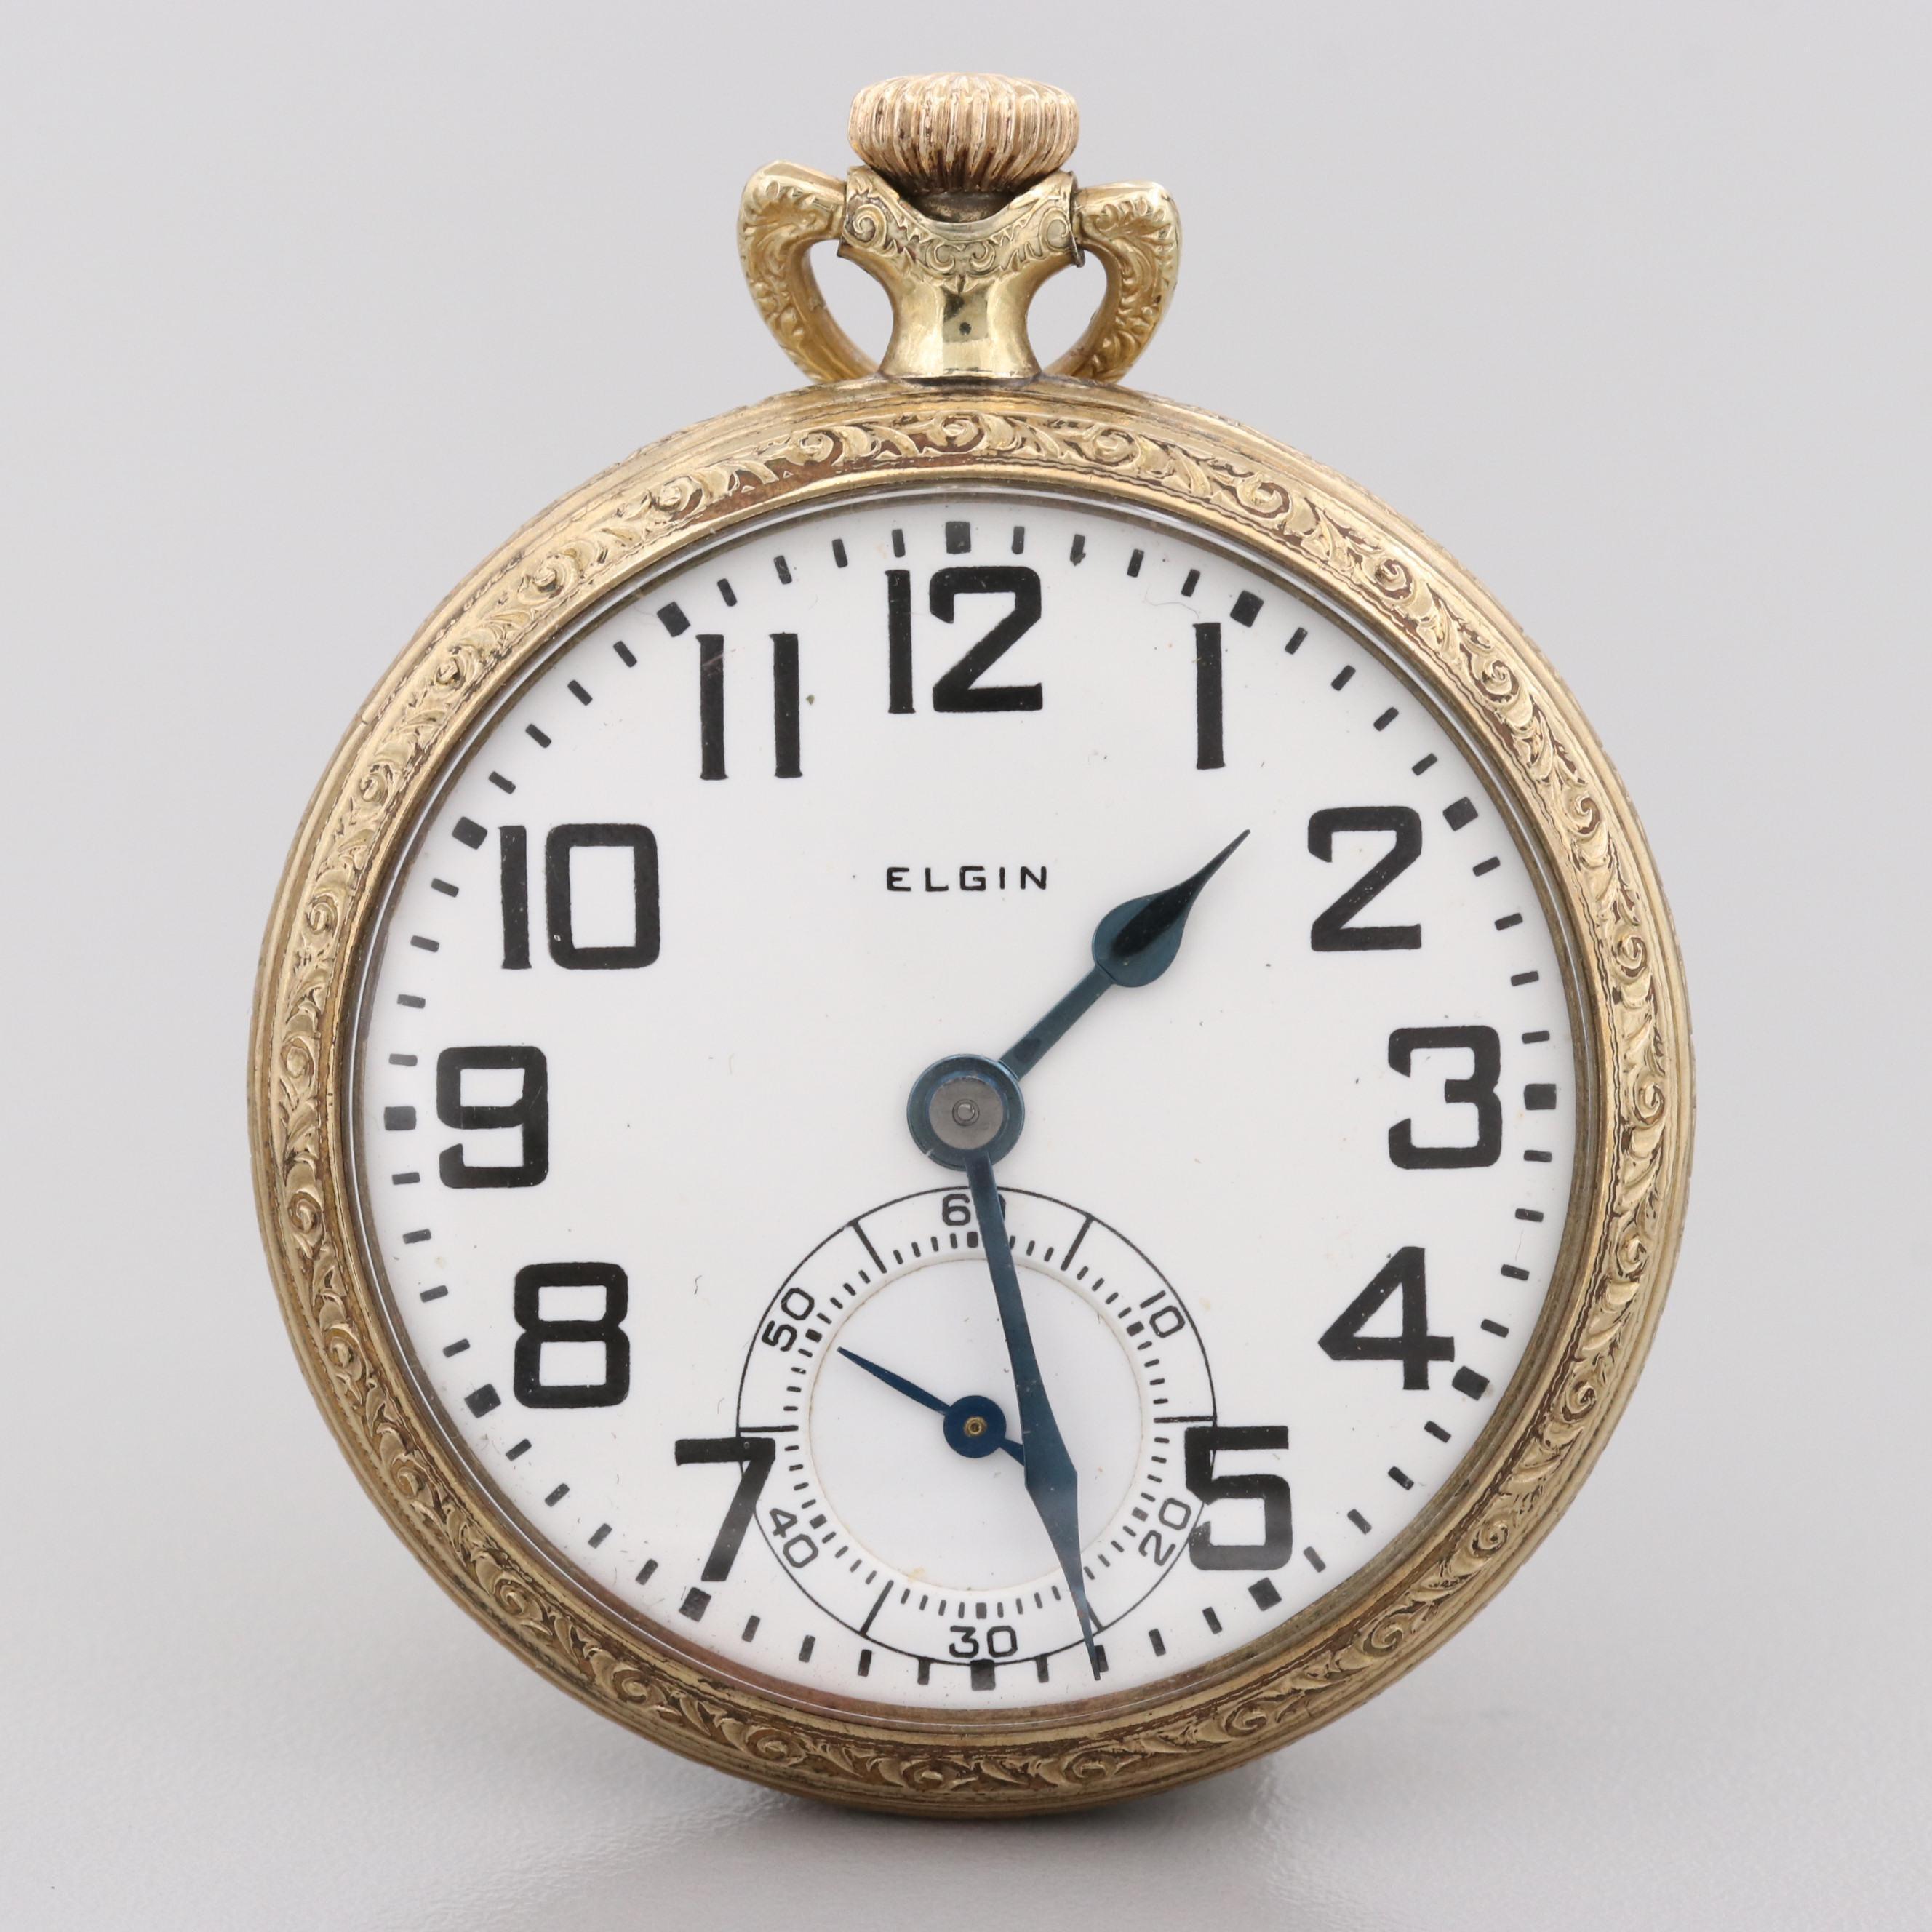 Elgin B.W. Raymond Gold Filled Pocket Watch, 1927